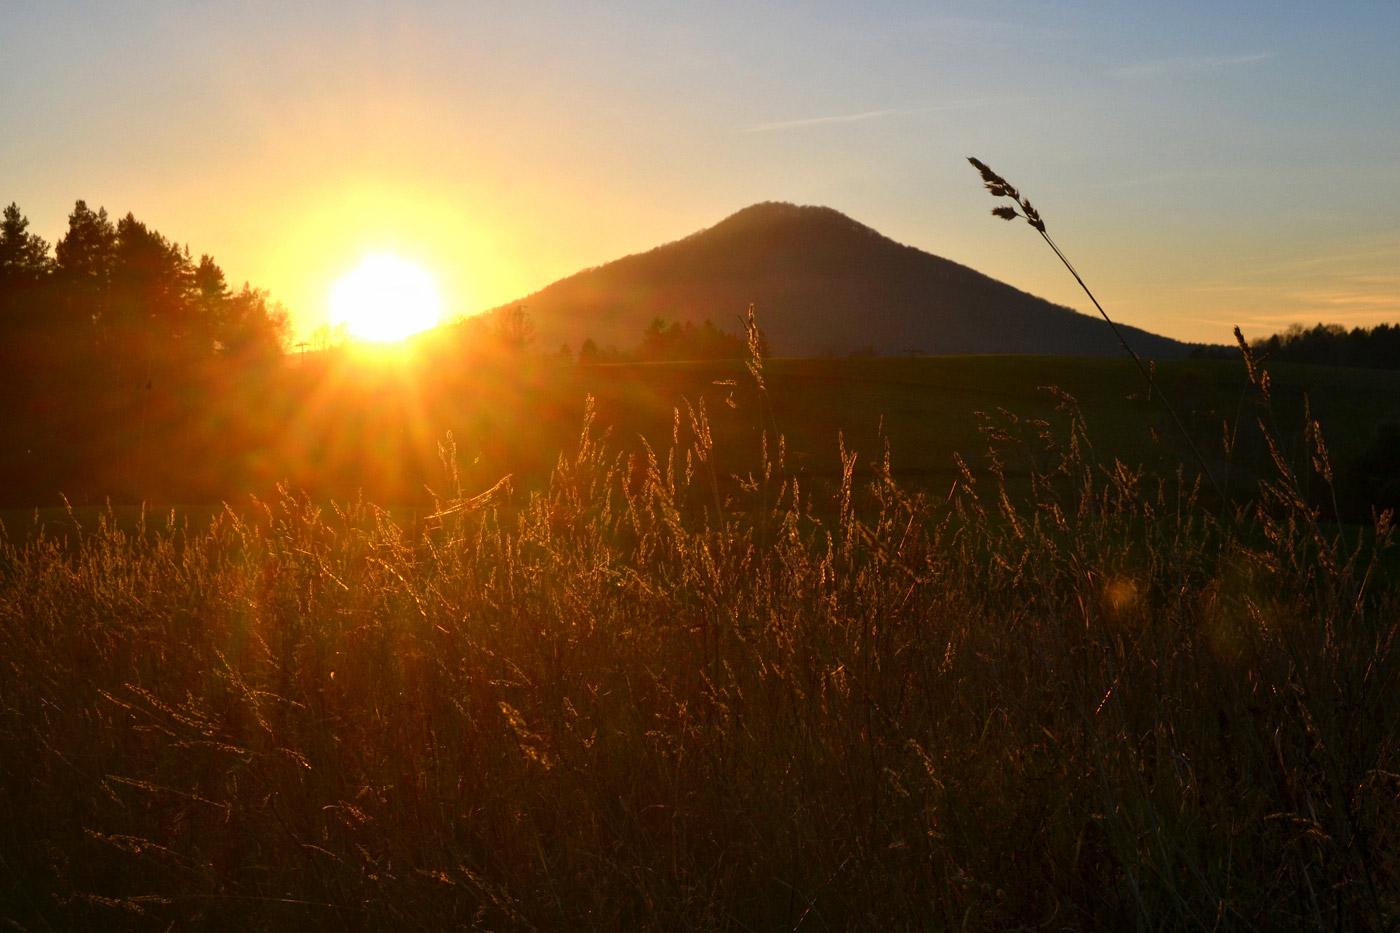 Sonnenuntergang am Rosenberg